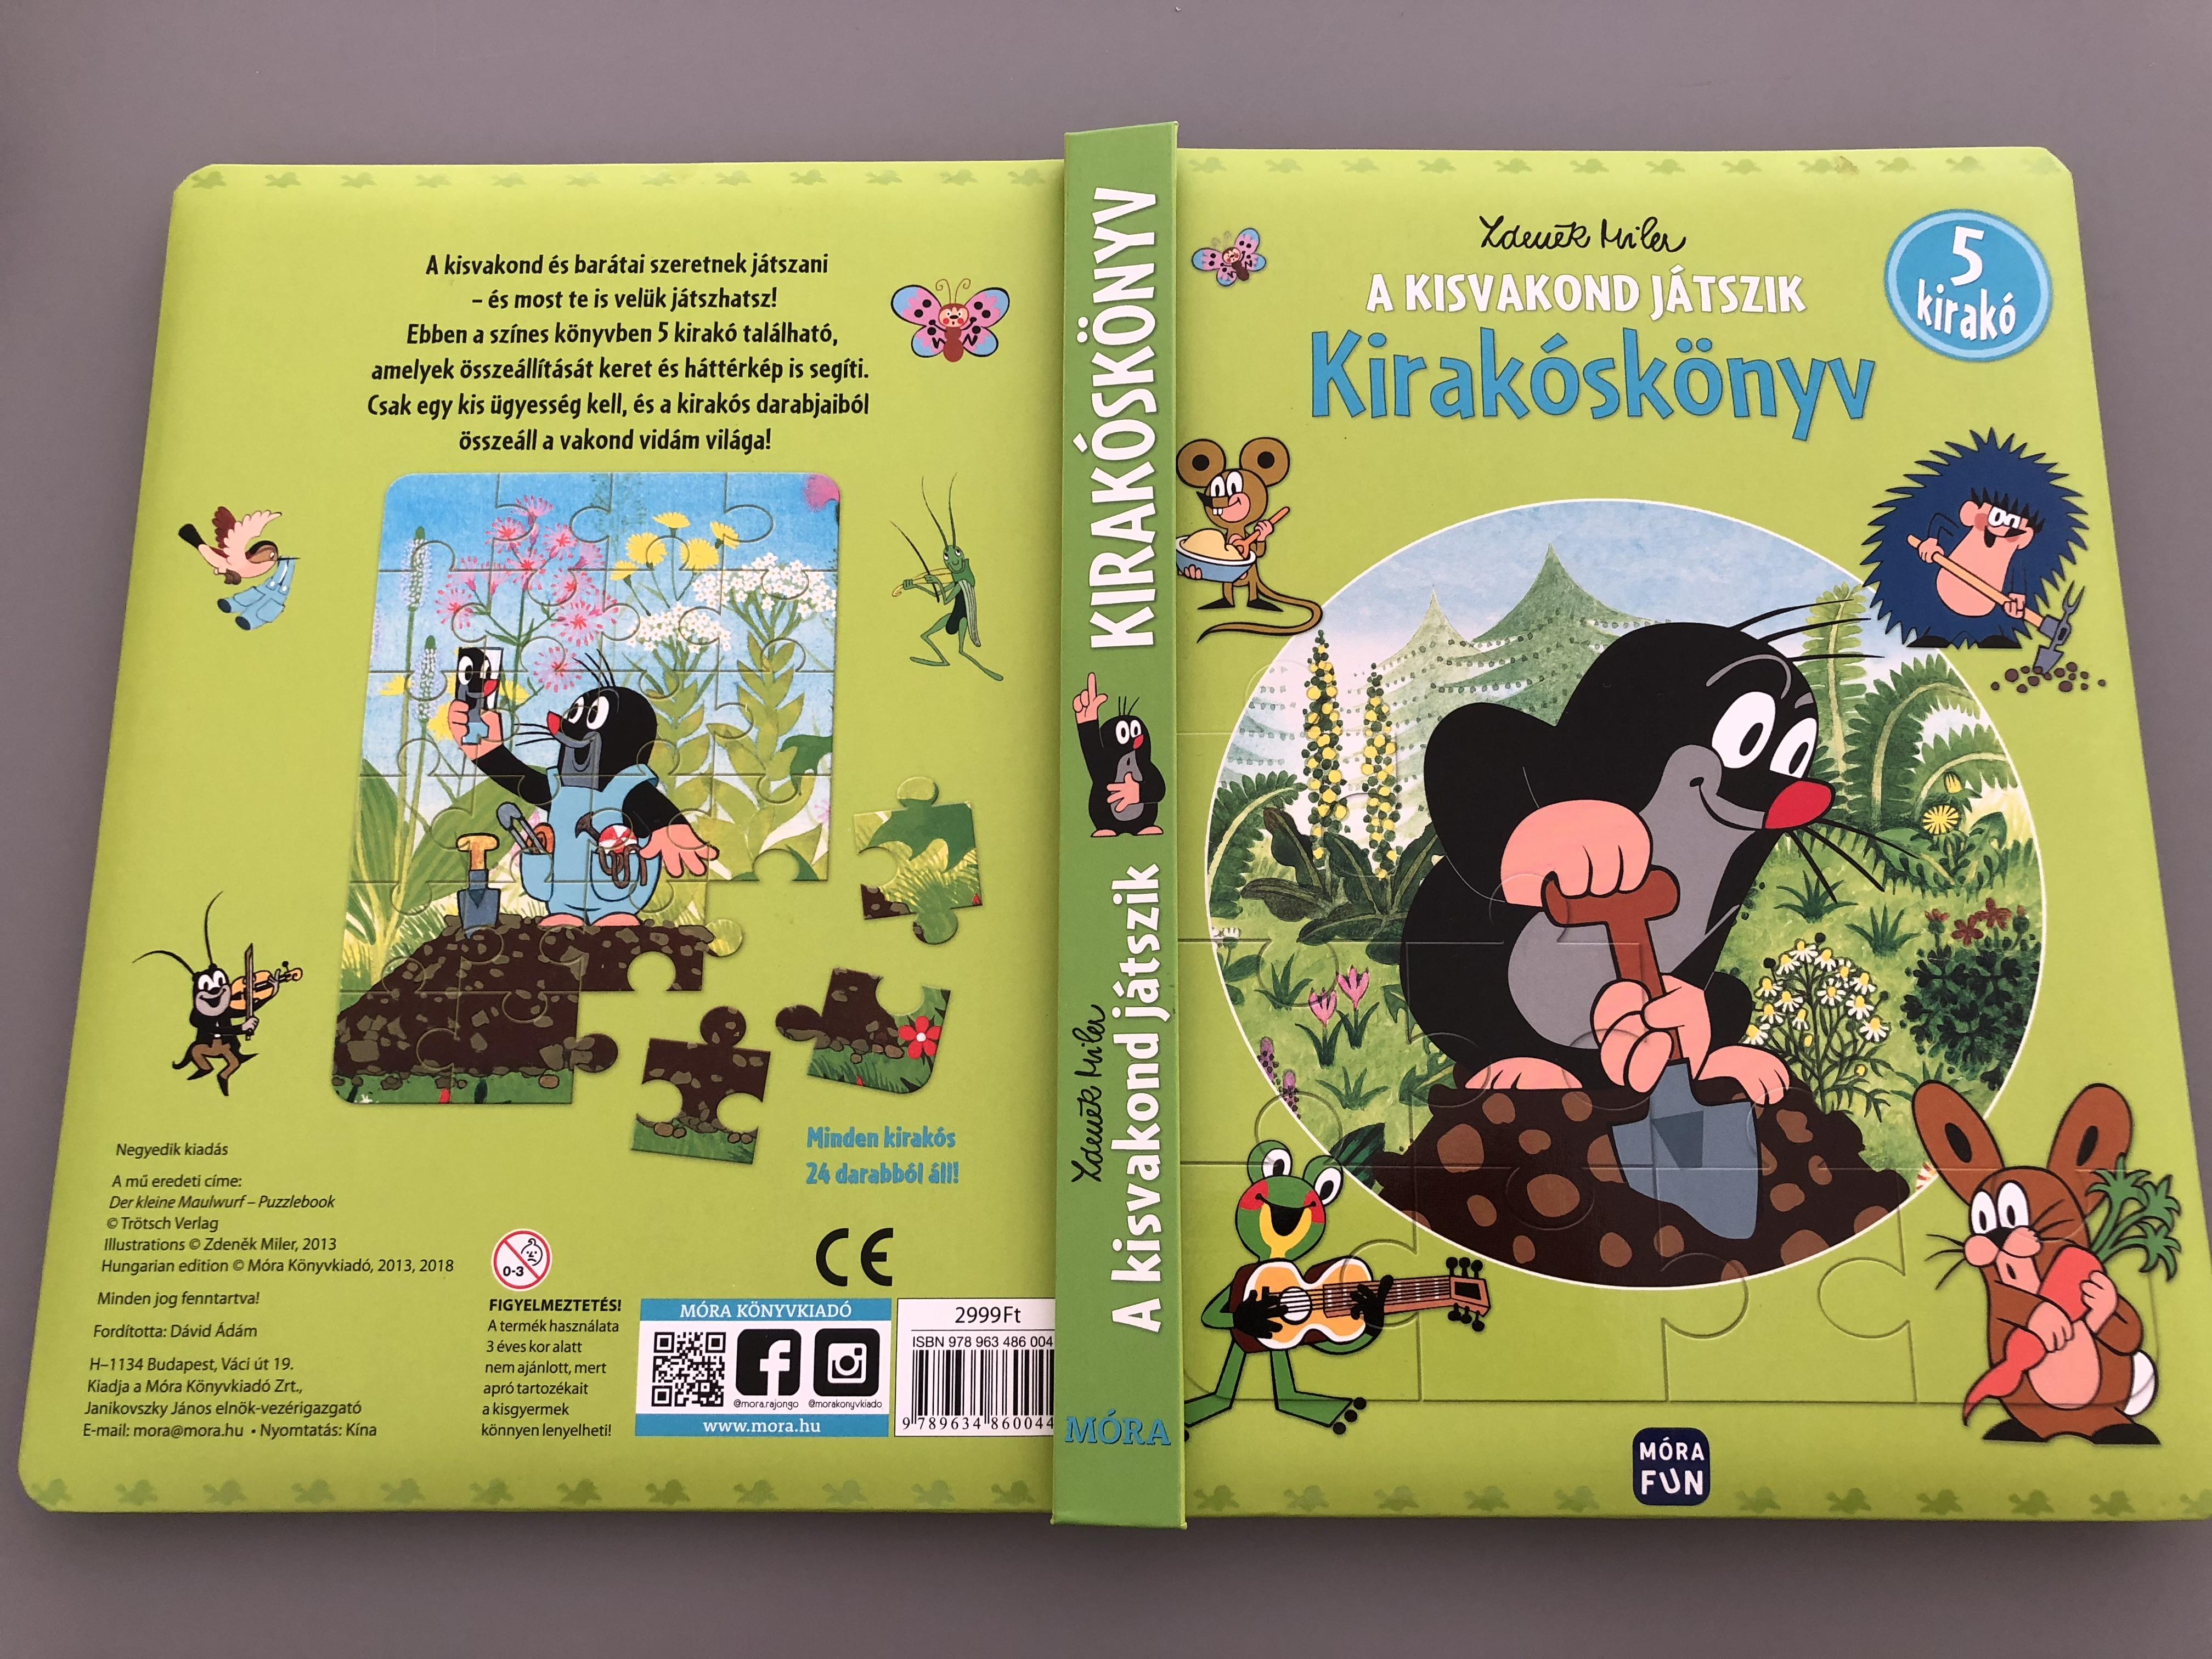 -kisvakond-j-tszik-kirak-sk-nyv-puzzlebook-zden-k-miler-der-kleine-maulwurf-has-5-puzzle-activity-pages-beautiful-full-color-krtek-the-mole-8-.jpg